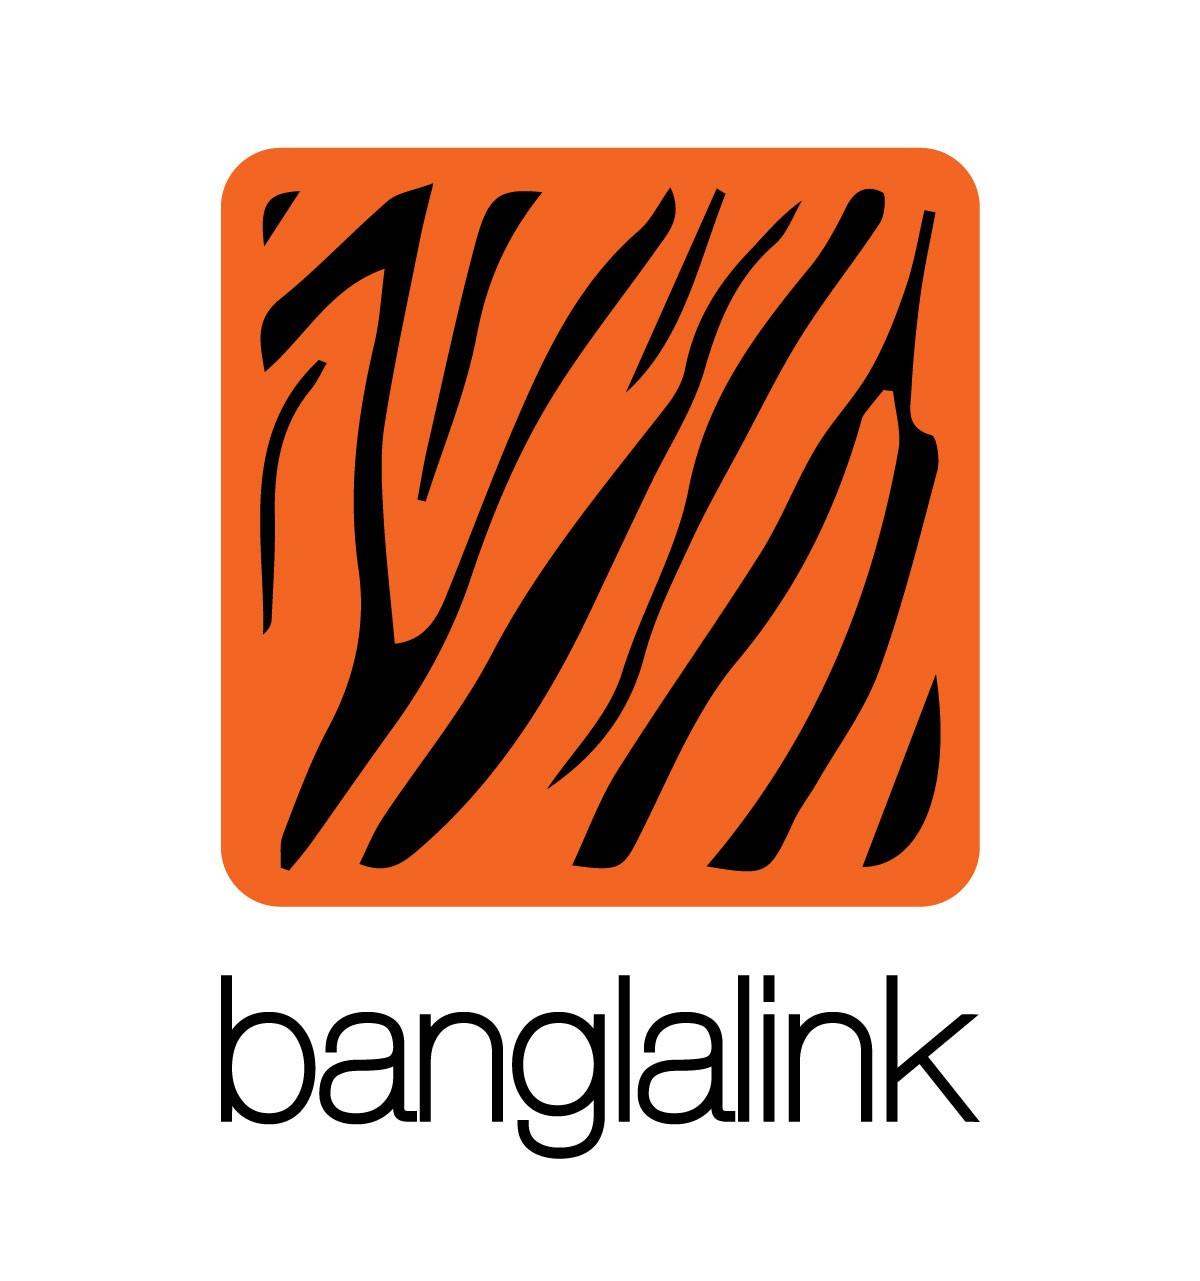 Banglalink Official Logo